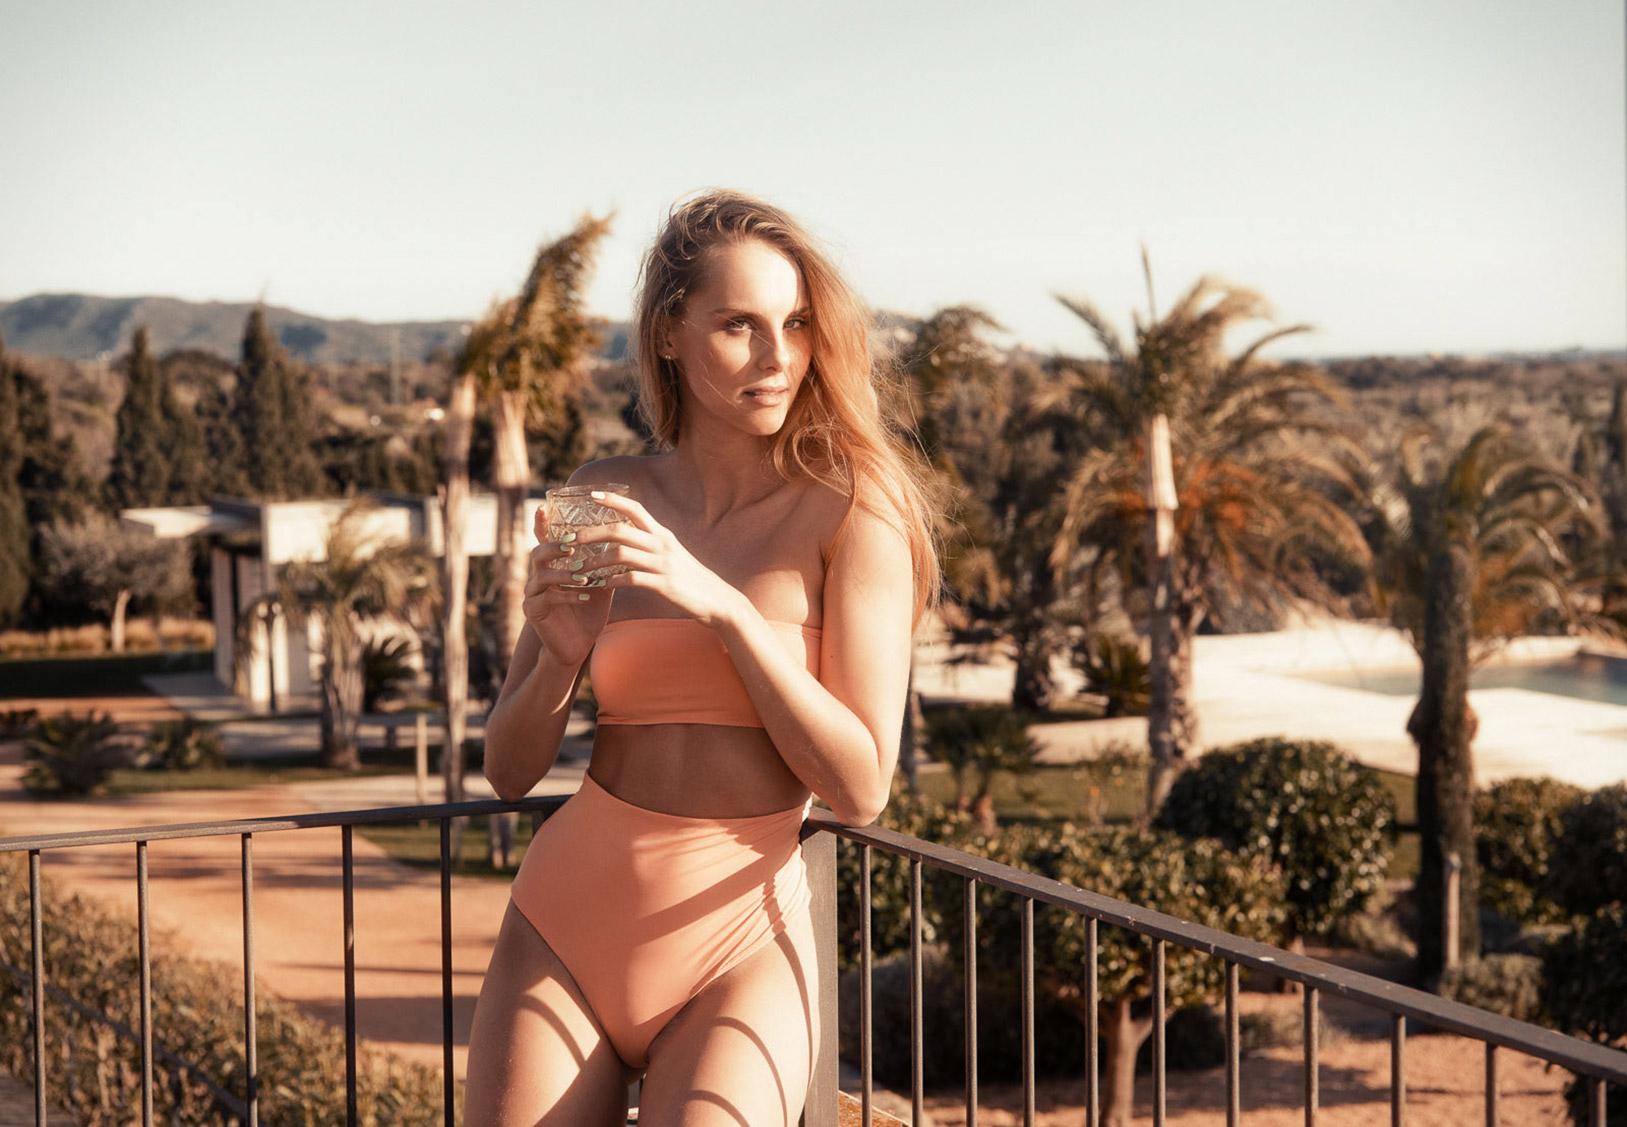 купальники Serendipity Intimates Swimwear spring-summer 2018 / Nastasya Prihoda by Markus Henttonen